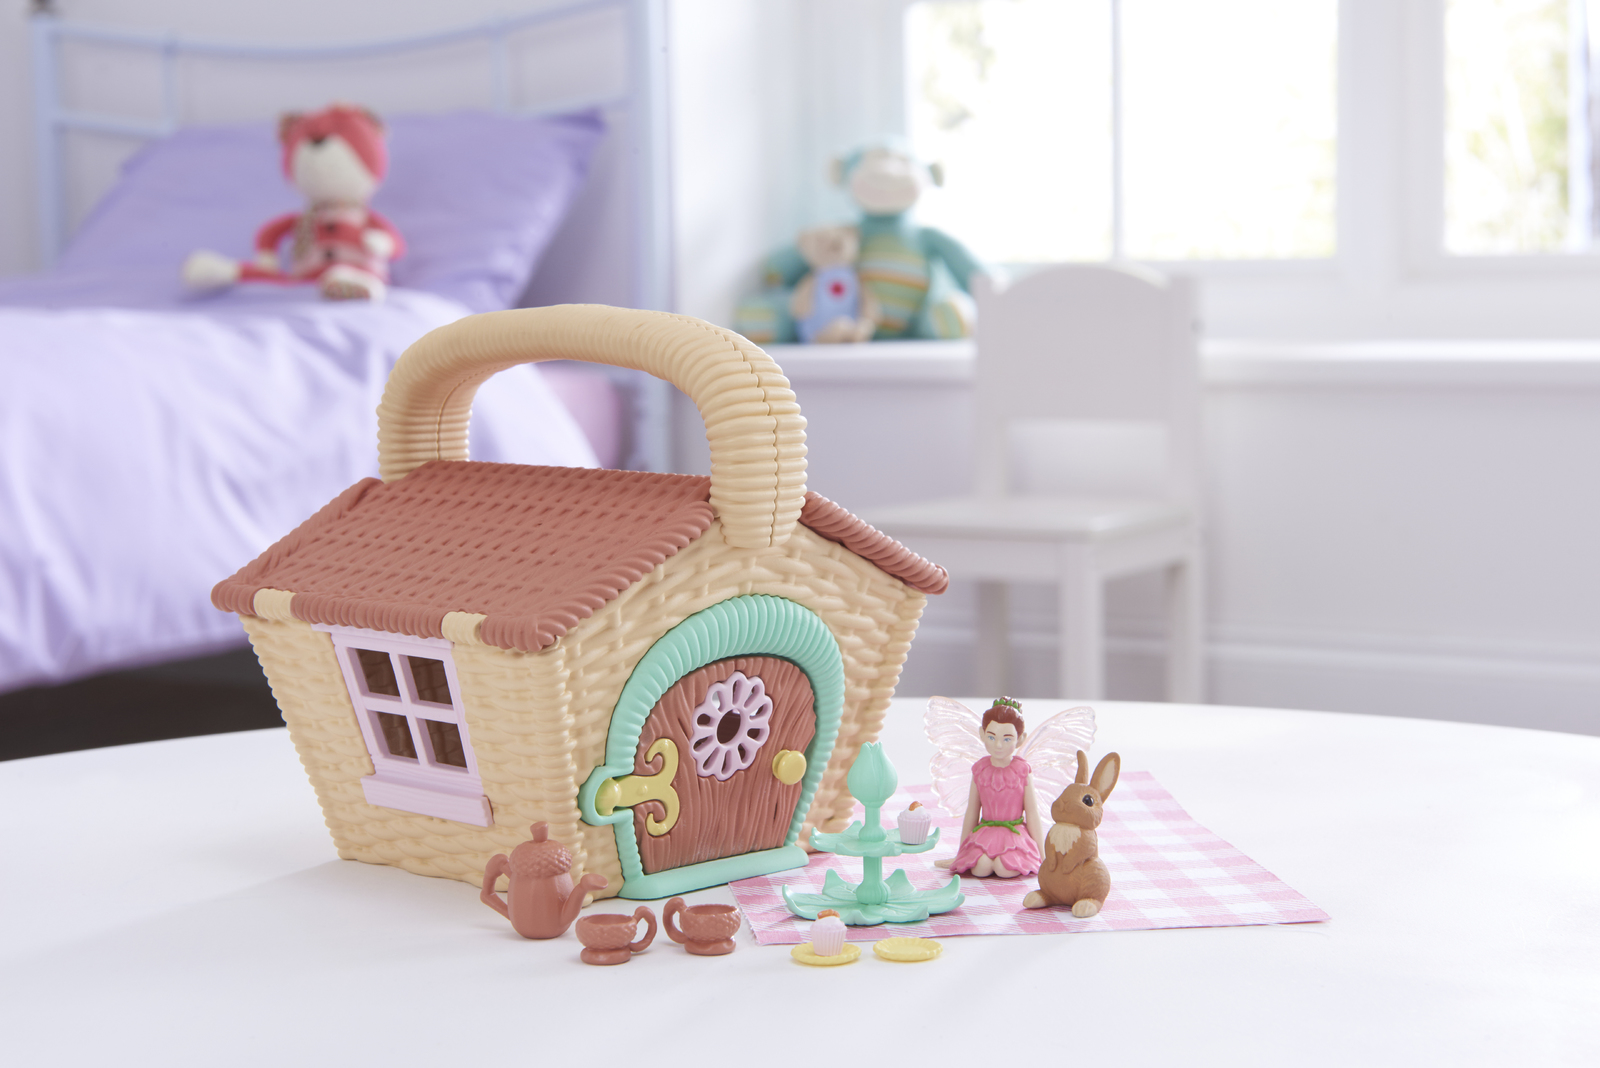 My Fairy Garden: Fairy Picnic Basket - Playset image